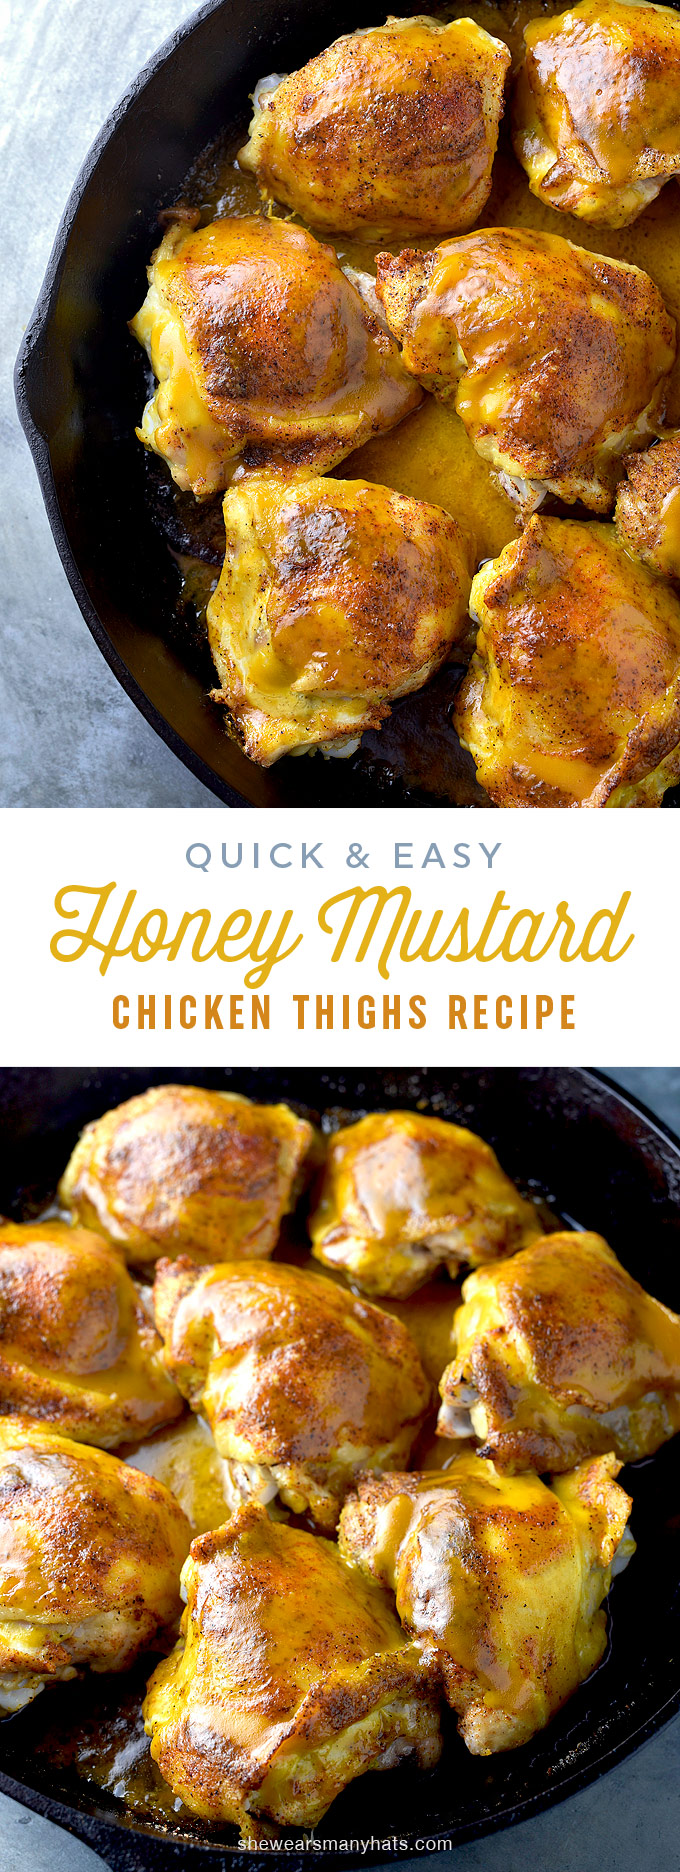 Honey Mustard Baked Chicken Thighs Recipe   She Wears Many ...